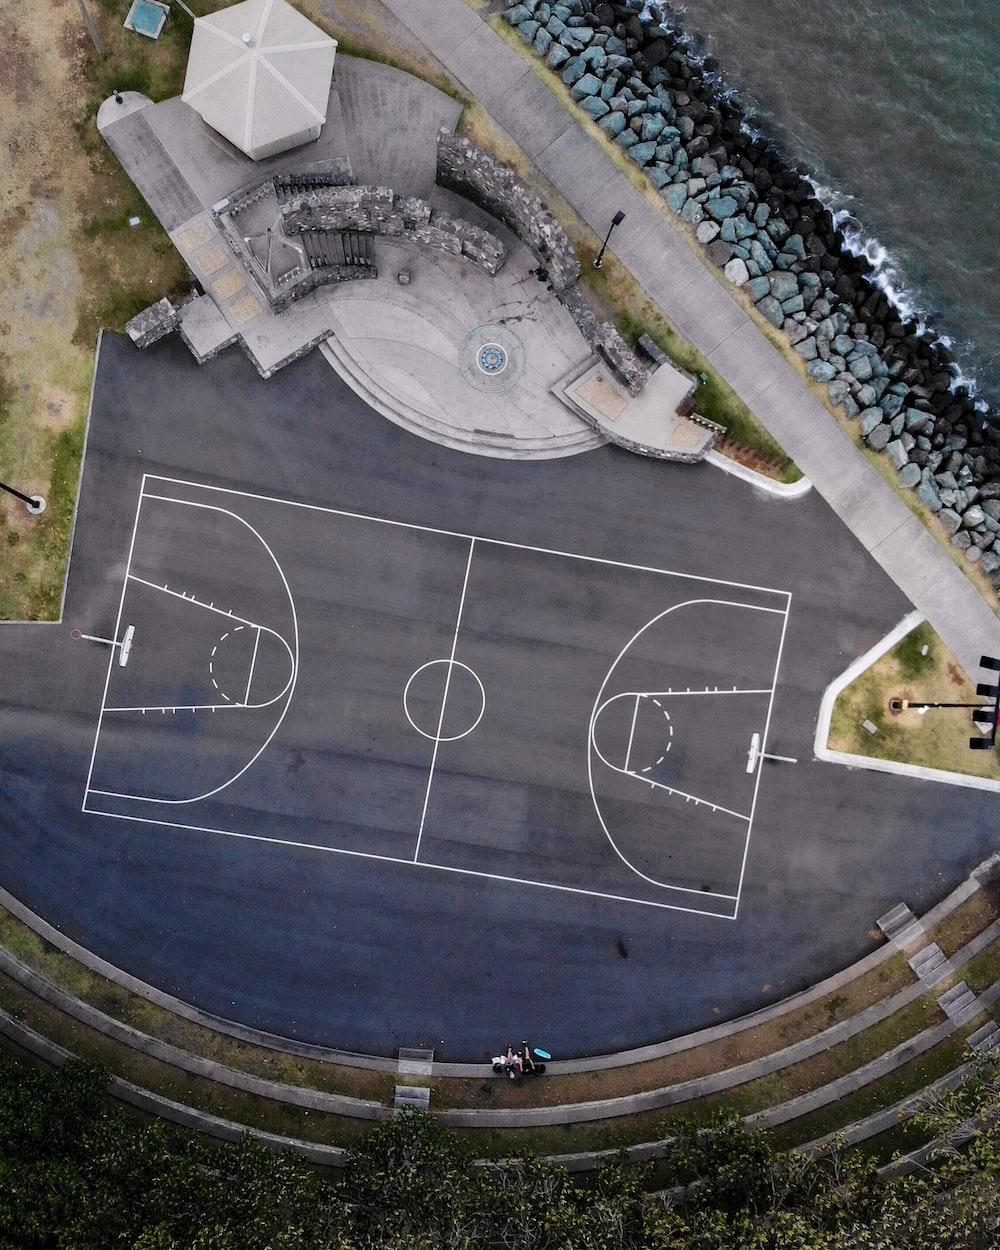 gray basketball court